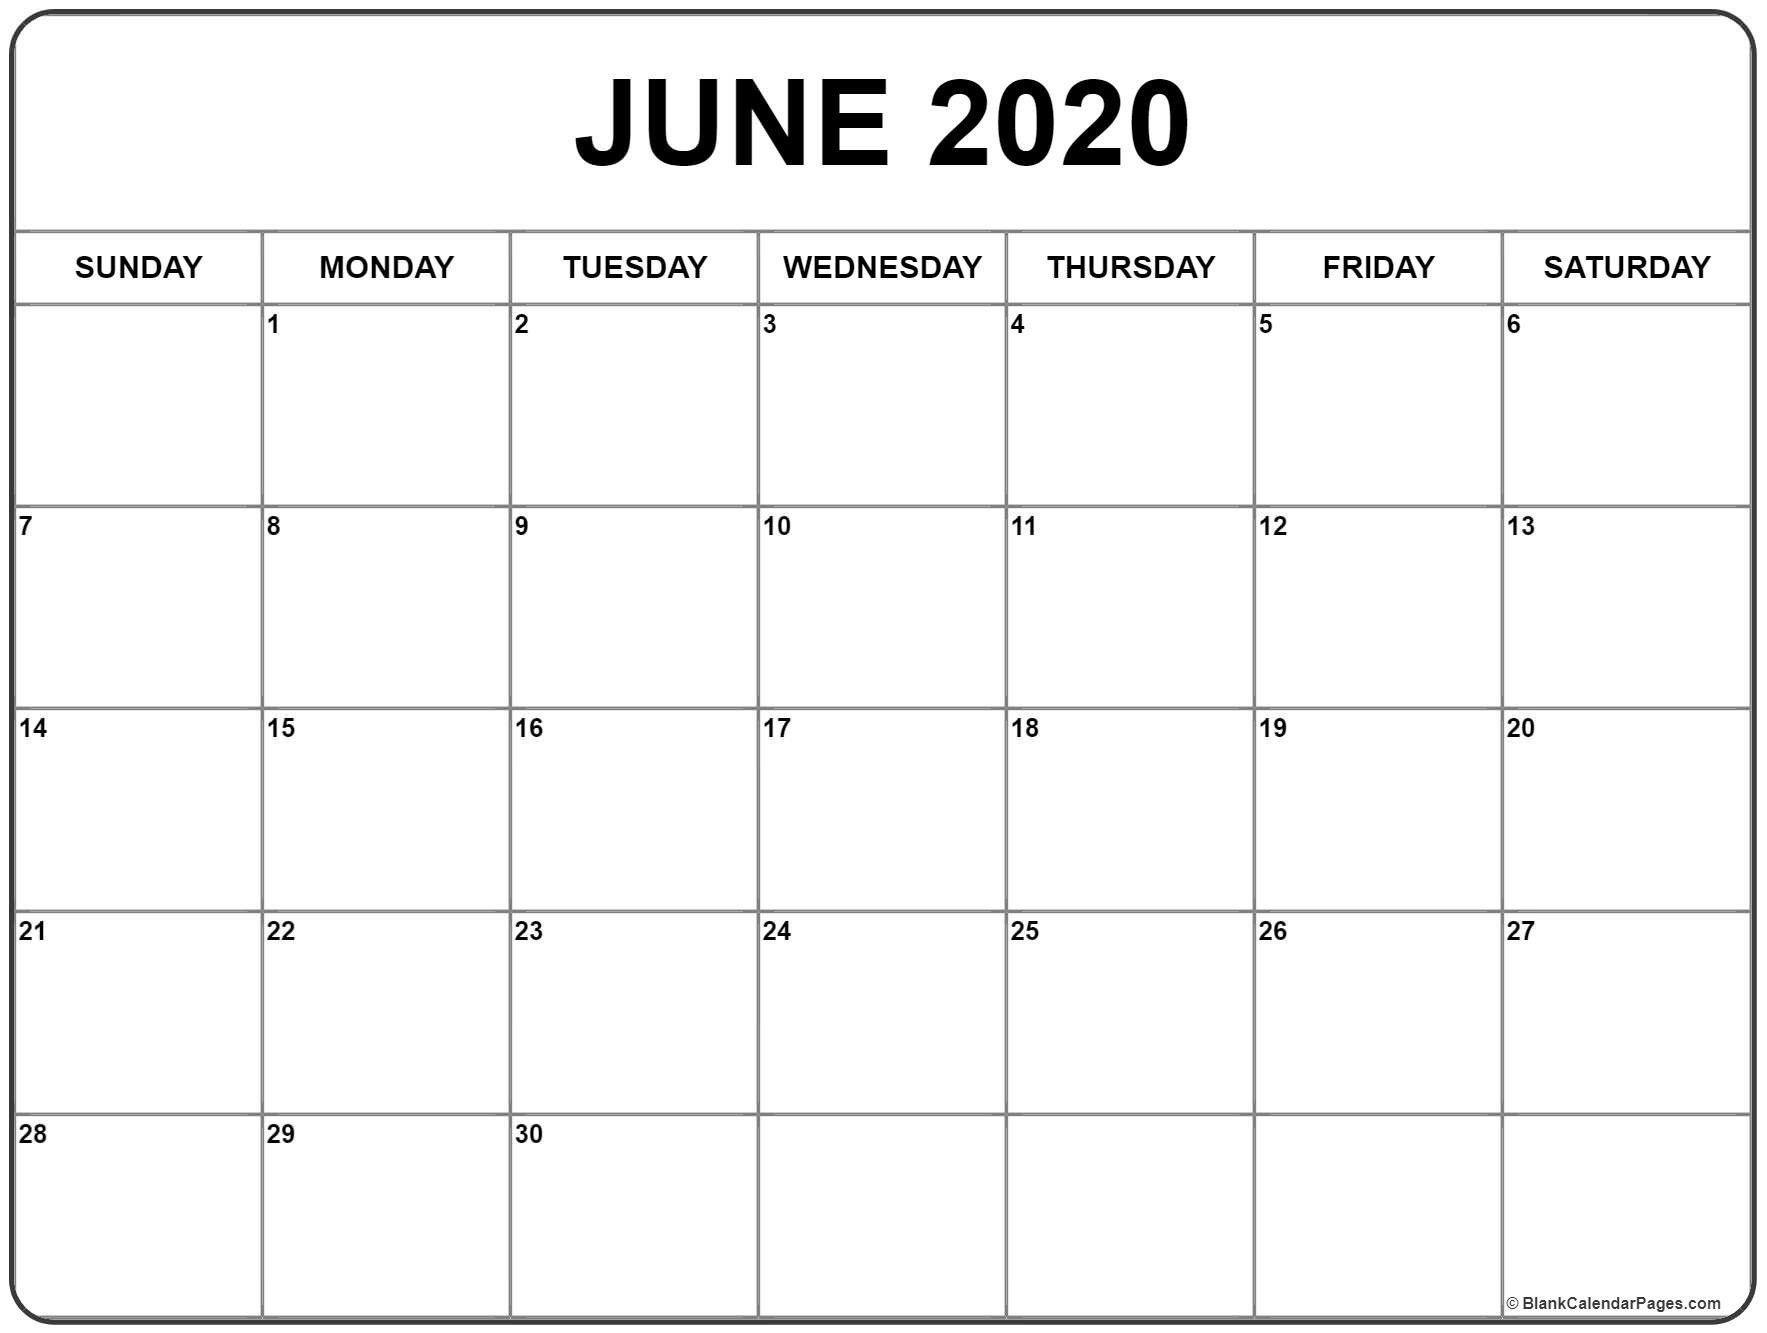 000 Unbelievable June 2020 Monthly Calendar Template Image Full